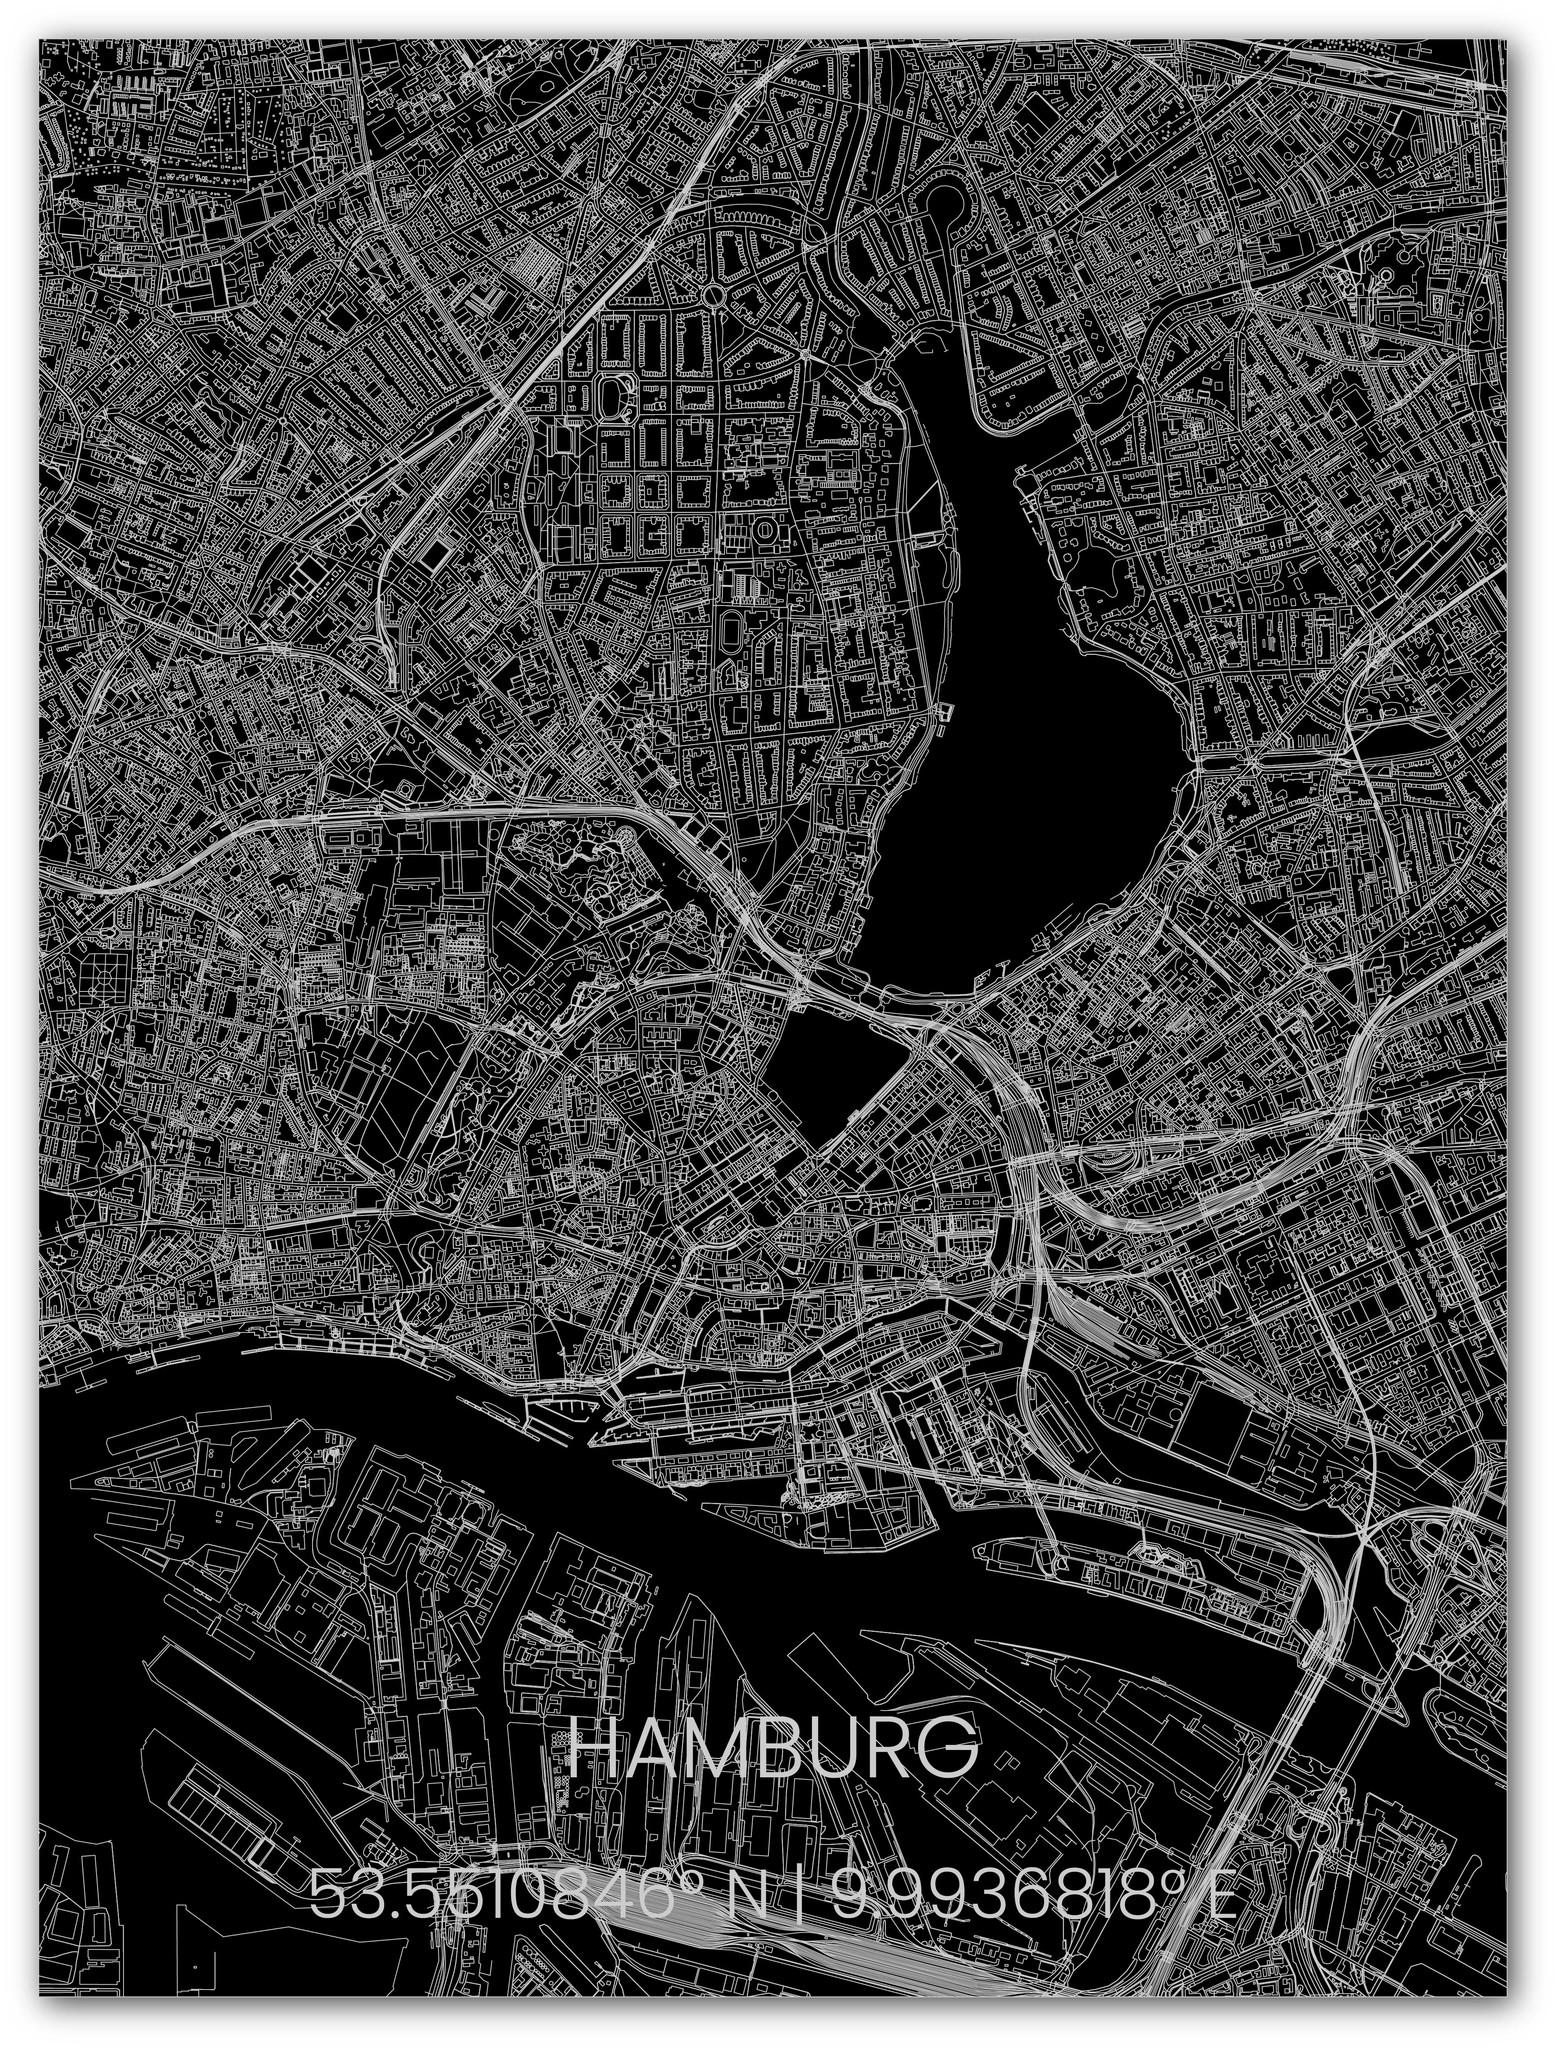 Metalen stadsplattegrond Hamburg-1